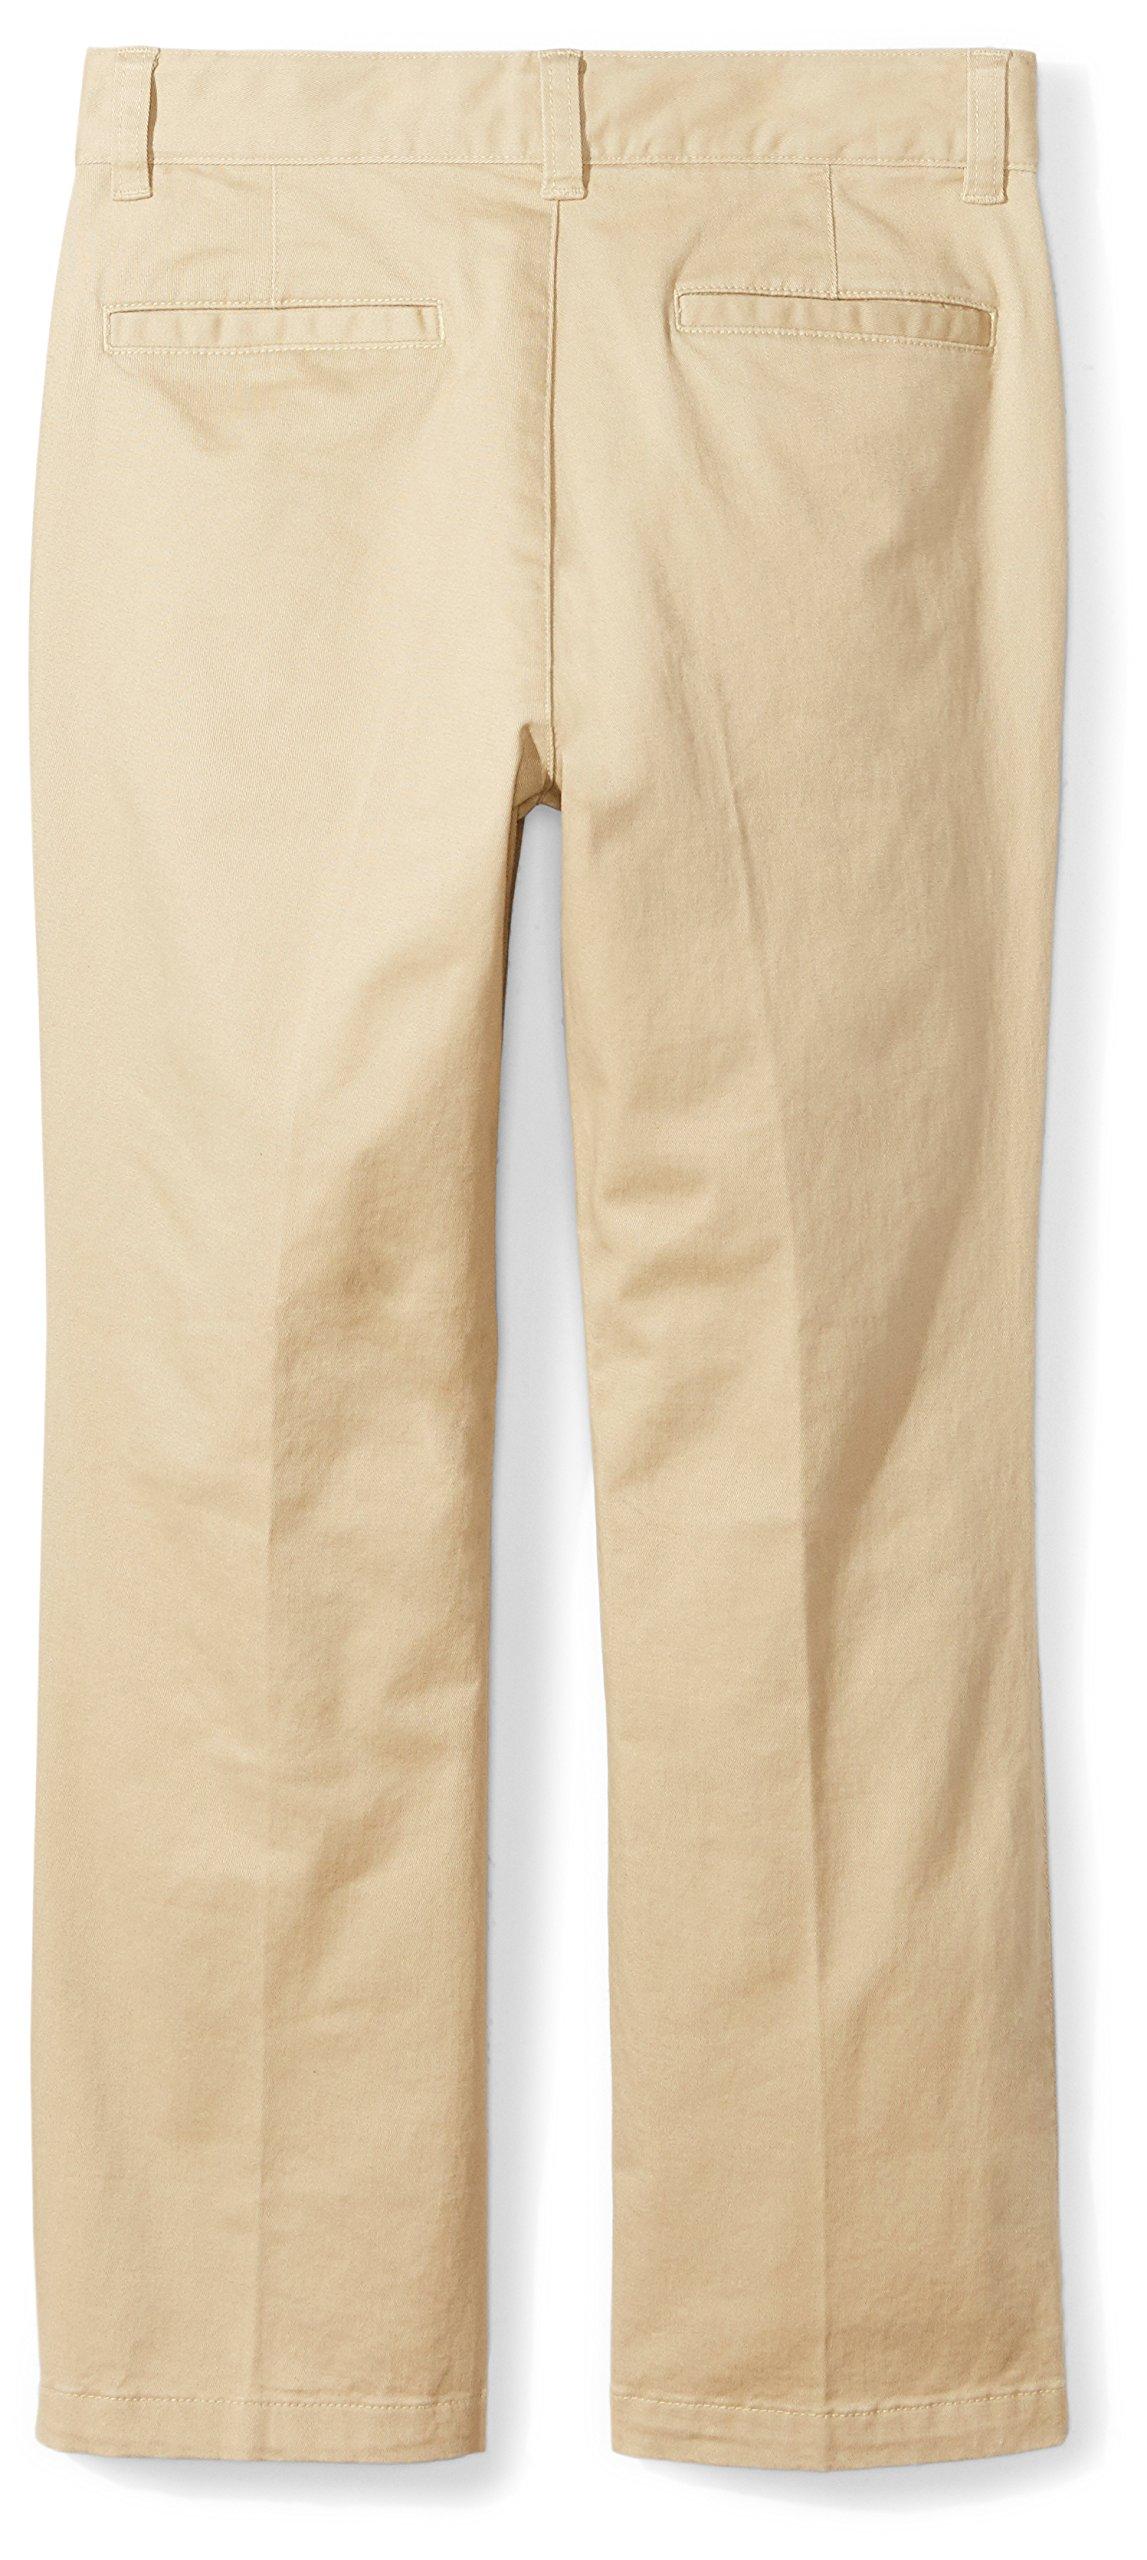 Amazon Essentials Boys' Straight Leg Flat Front Uniform Chino Pant, Khaki,10 by Amazon Essentials (Image #3)